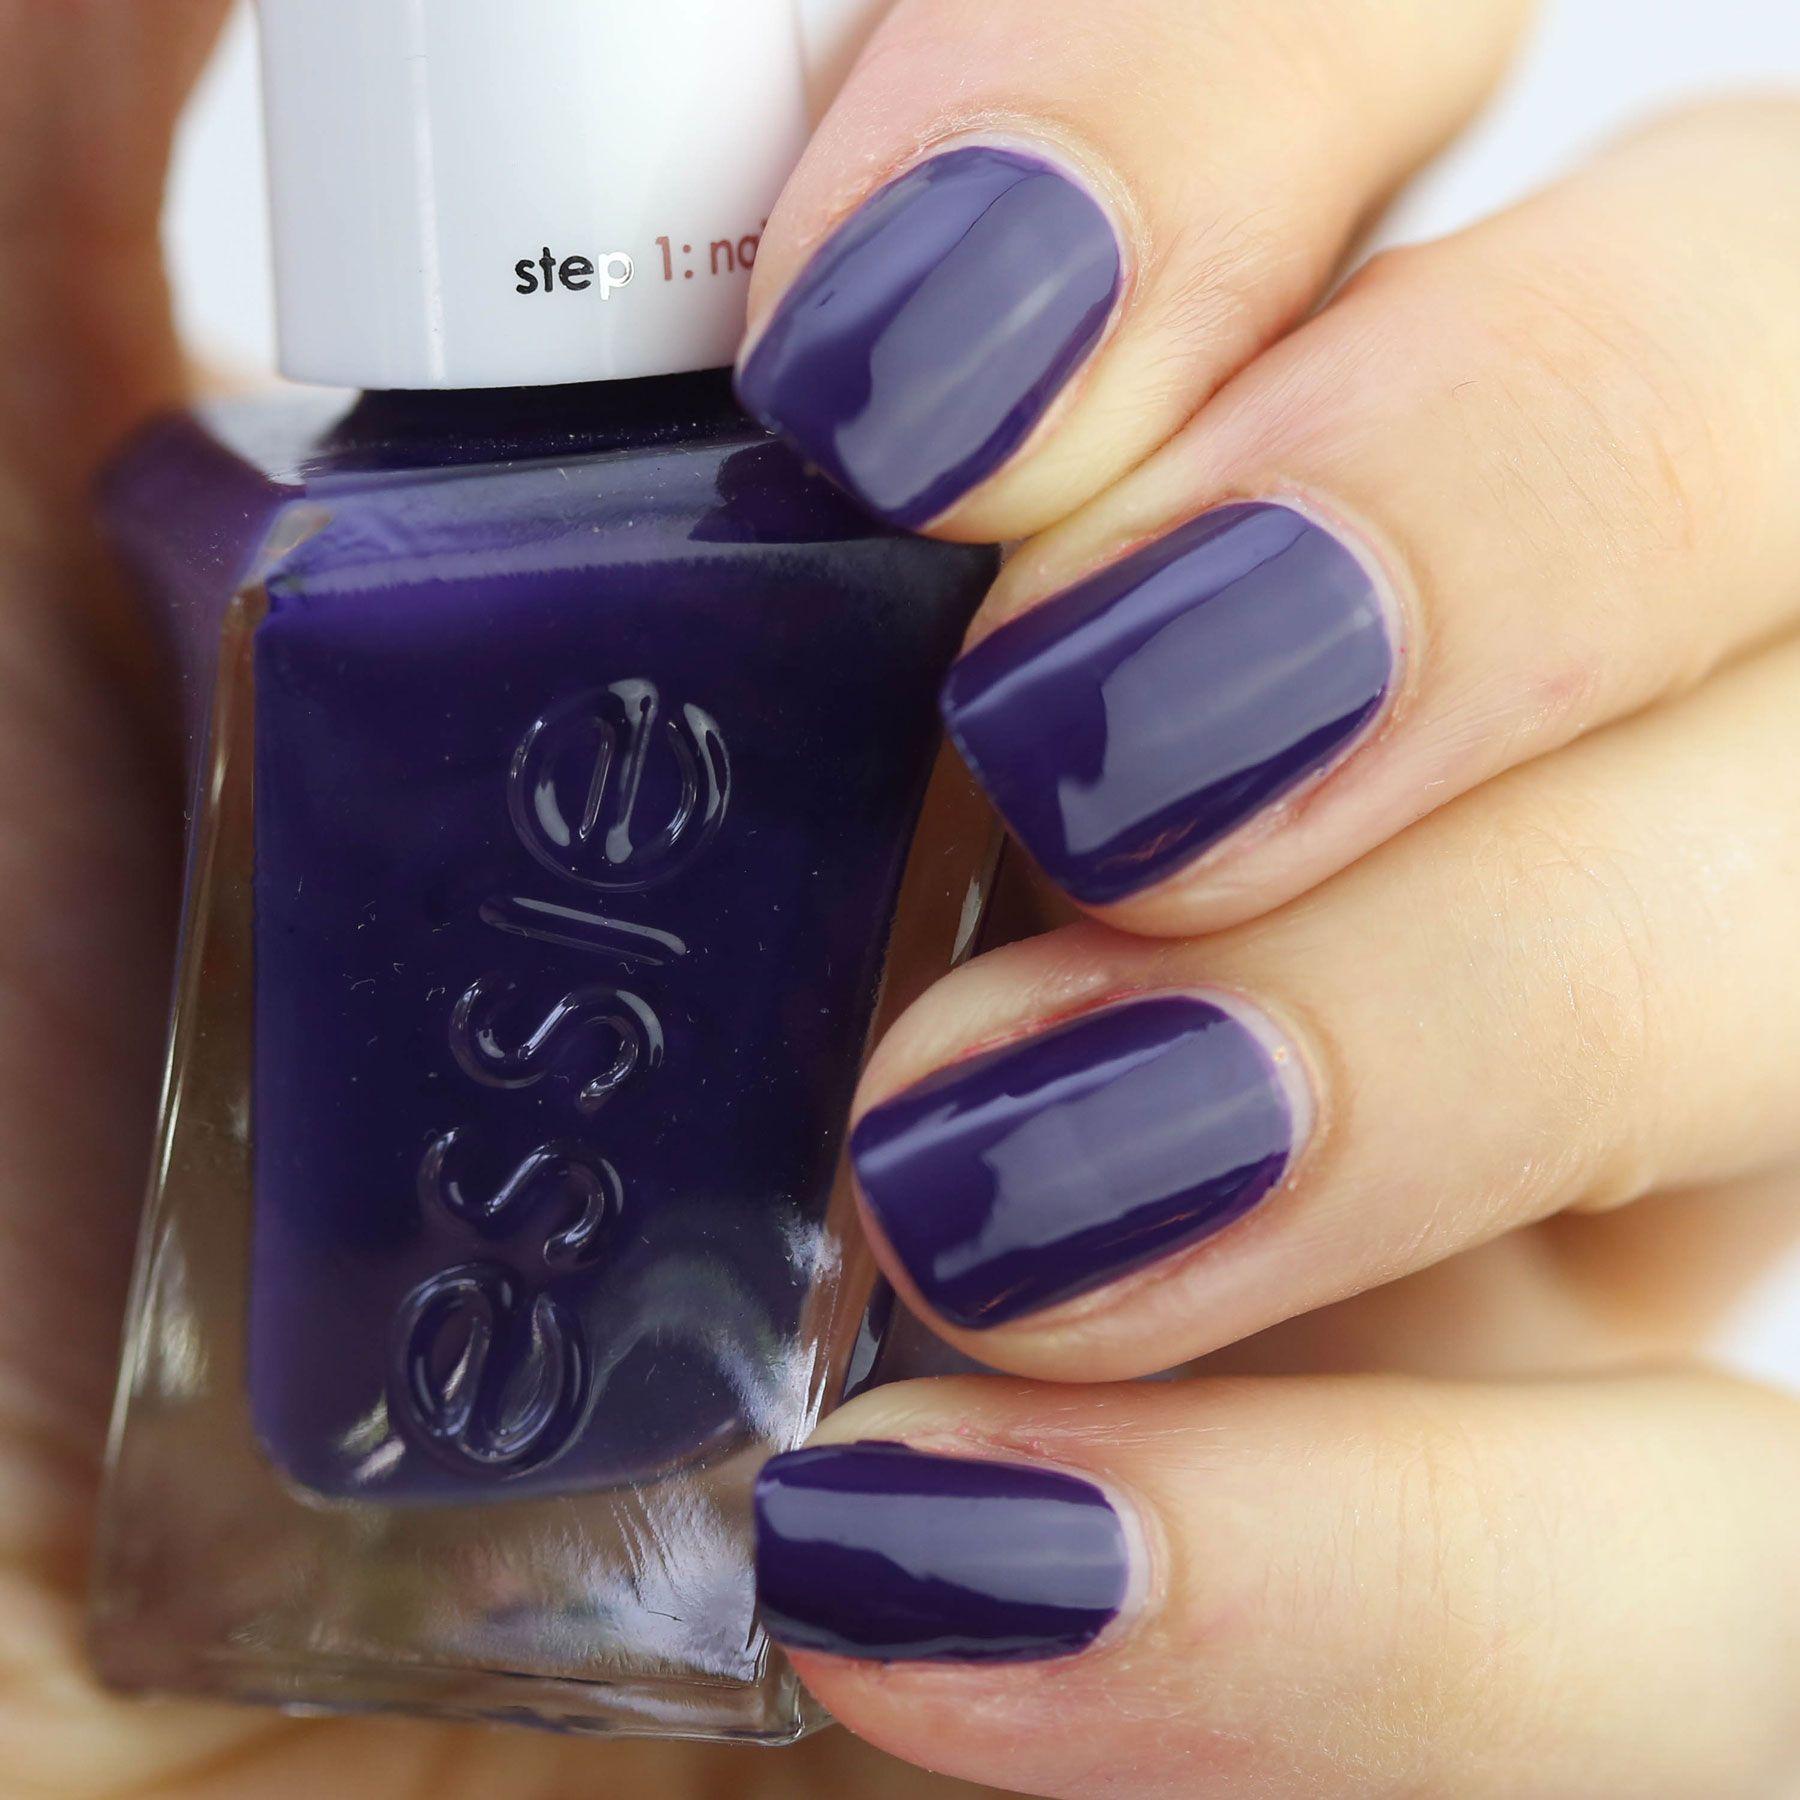 Pin de AnnaMarie ✩ en Nails   Pinterest   Esmalte